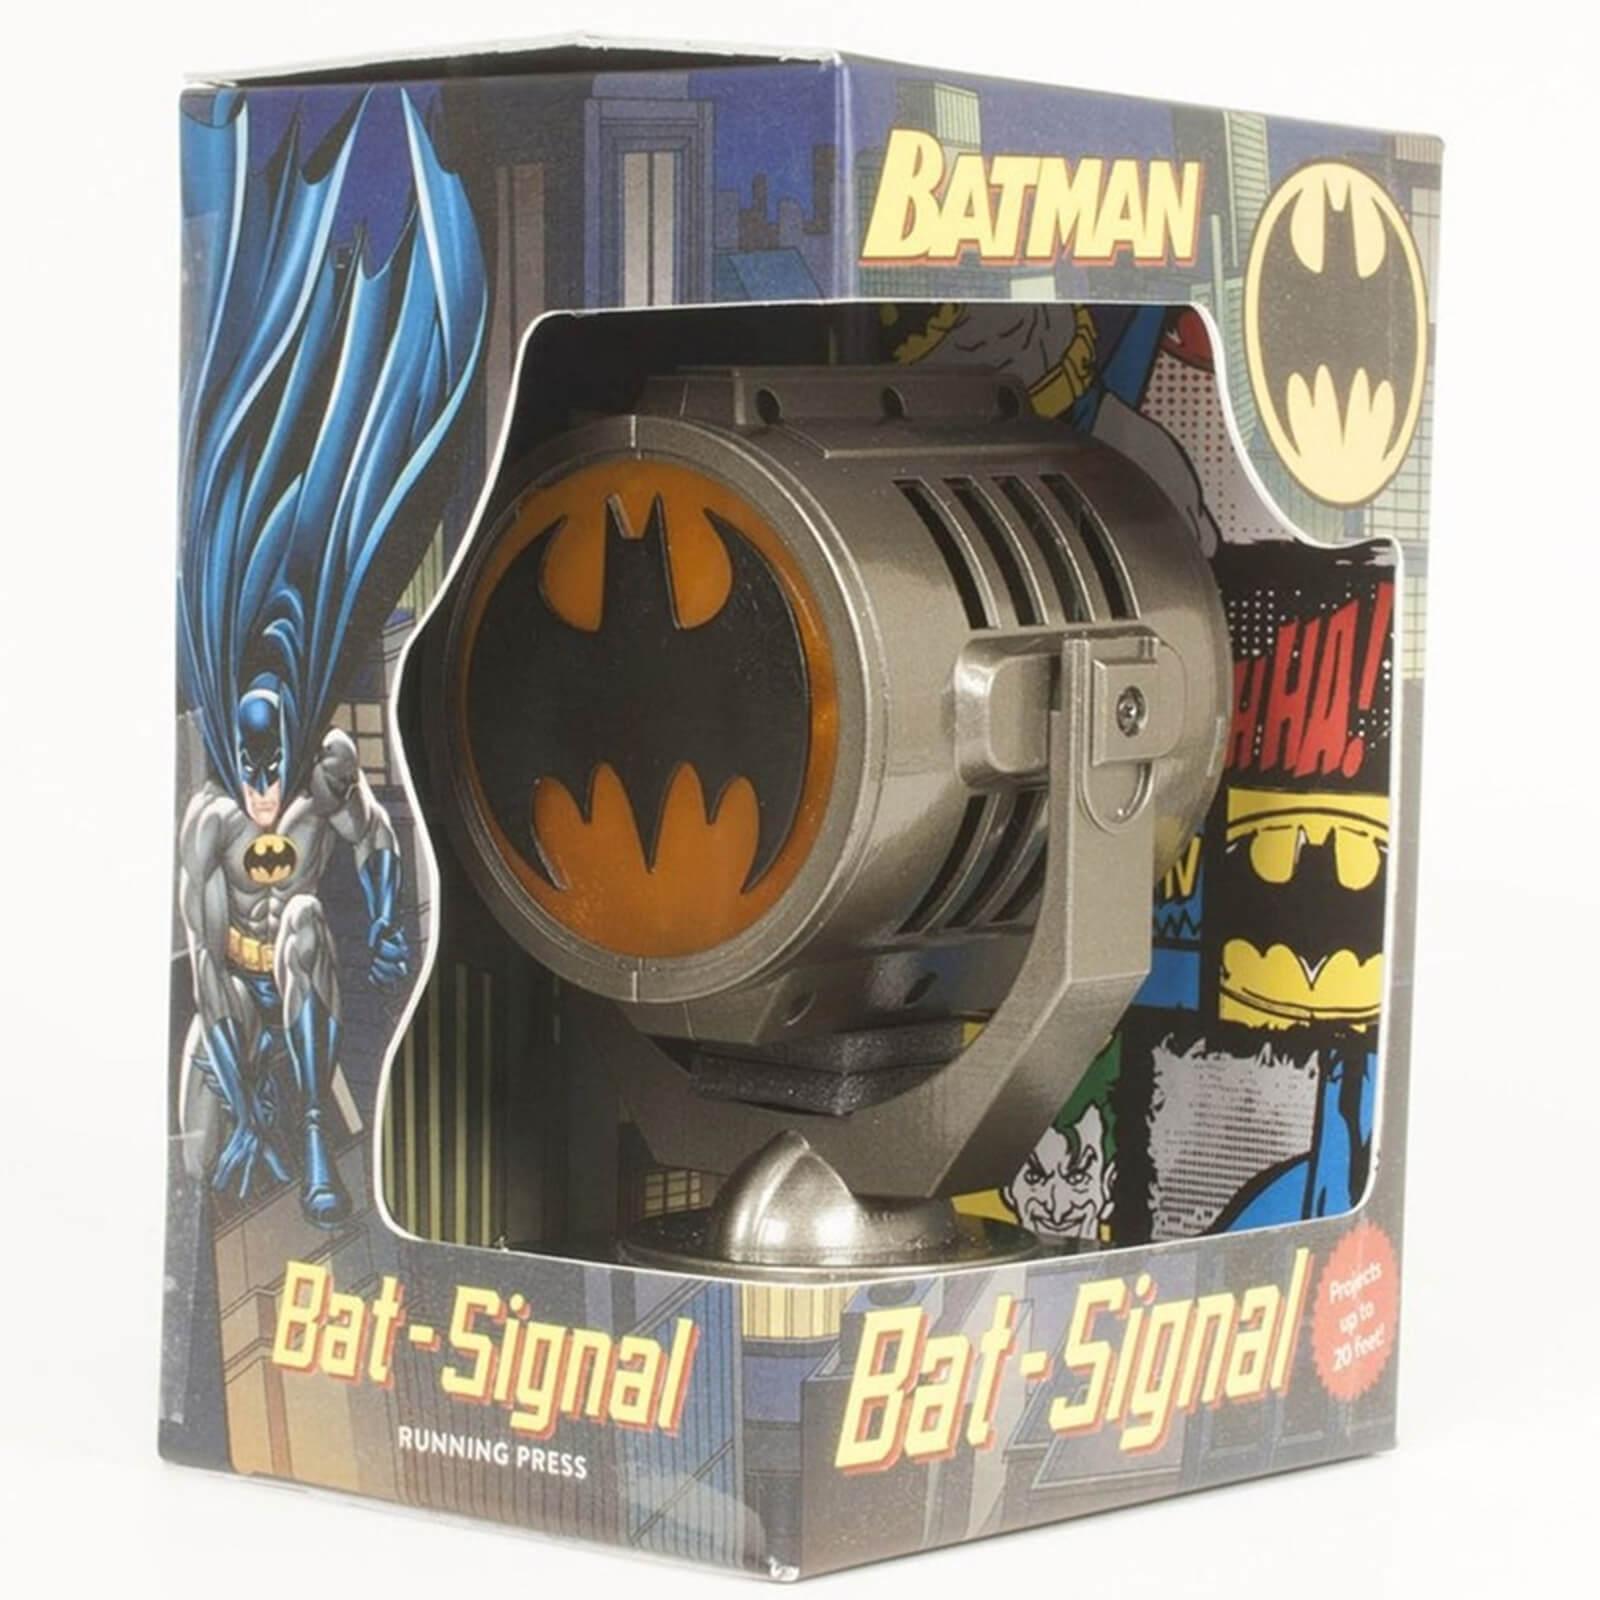 Batman: Metal Die Cast Bat Signal DeluxeKit